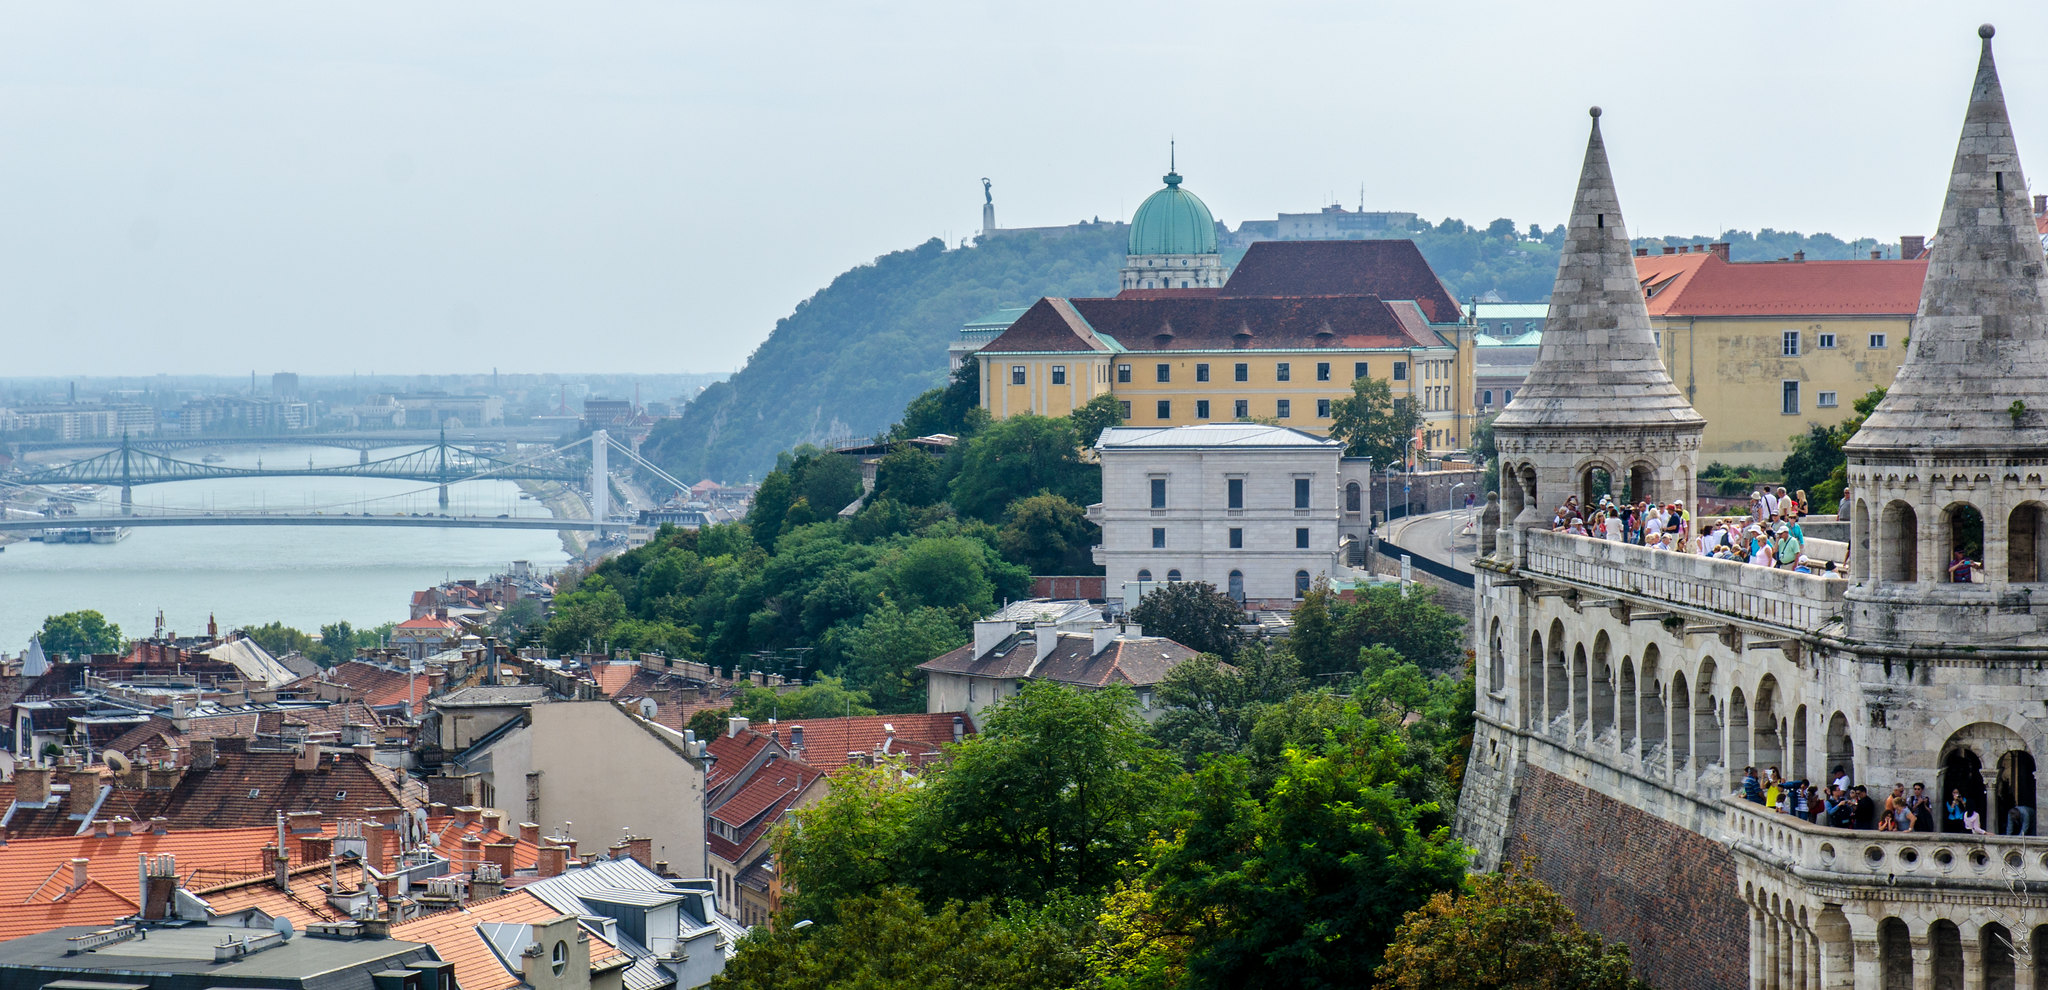 PragueVienneBudapest-Flickr-20